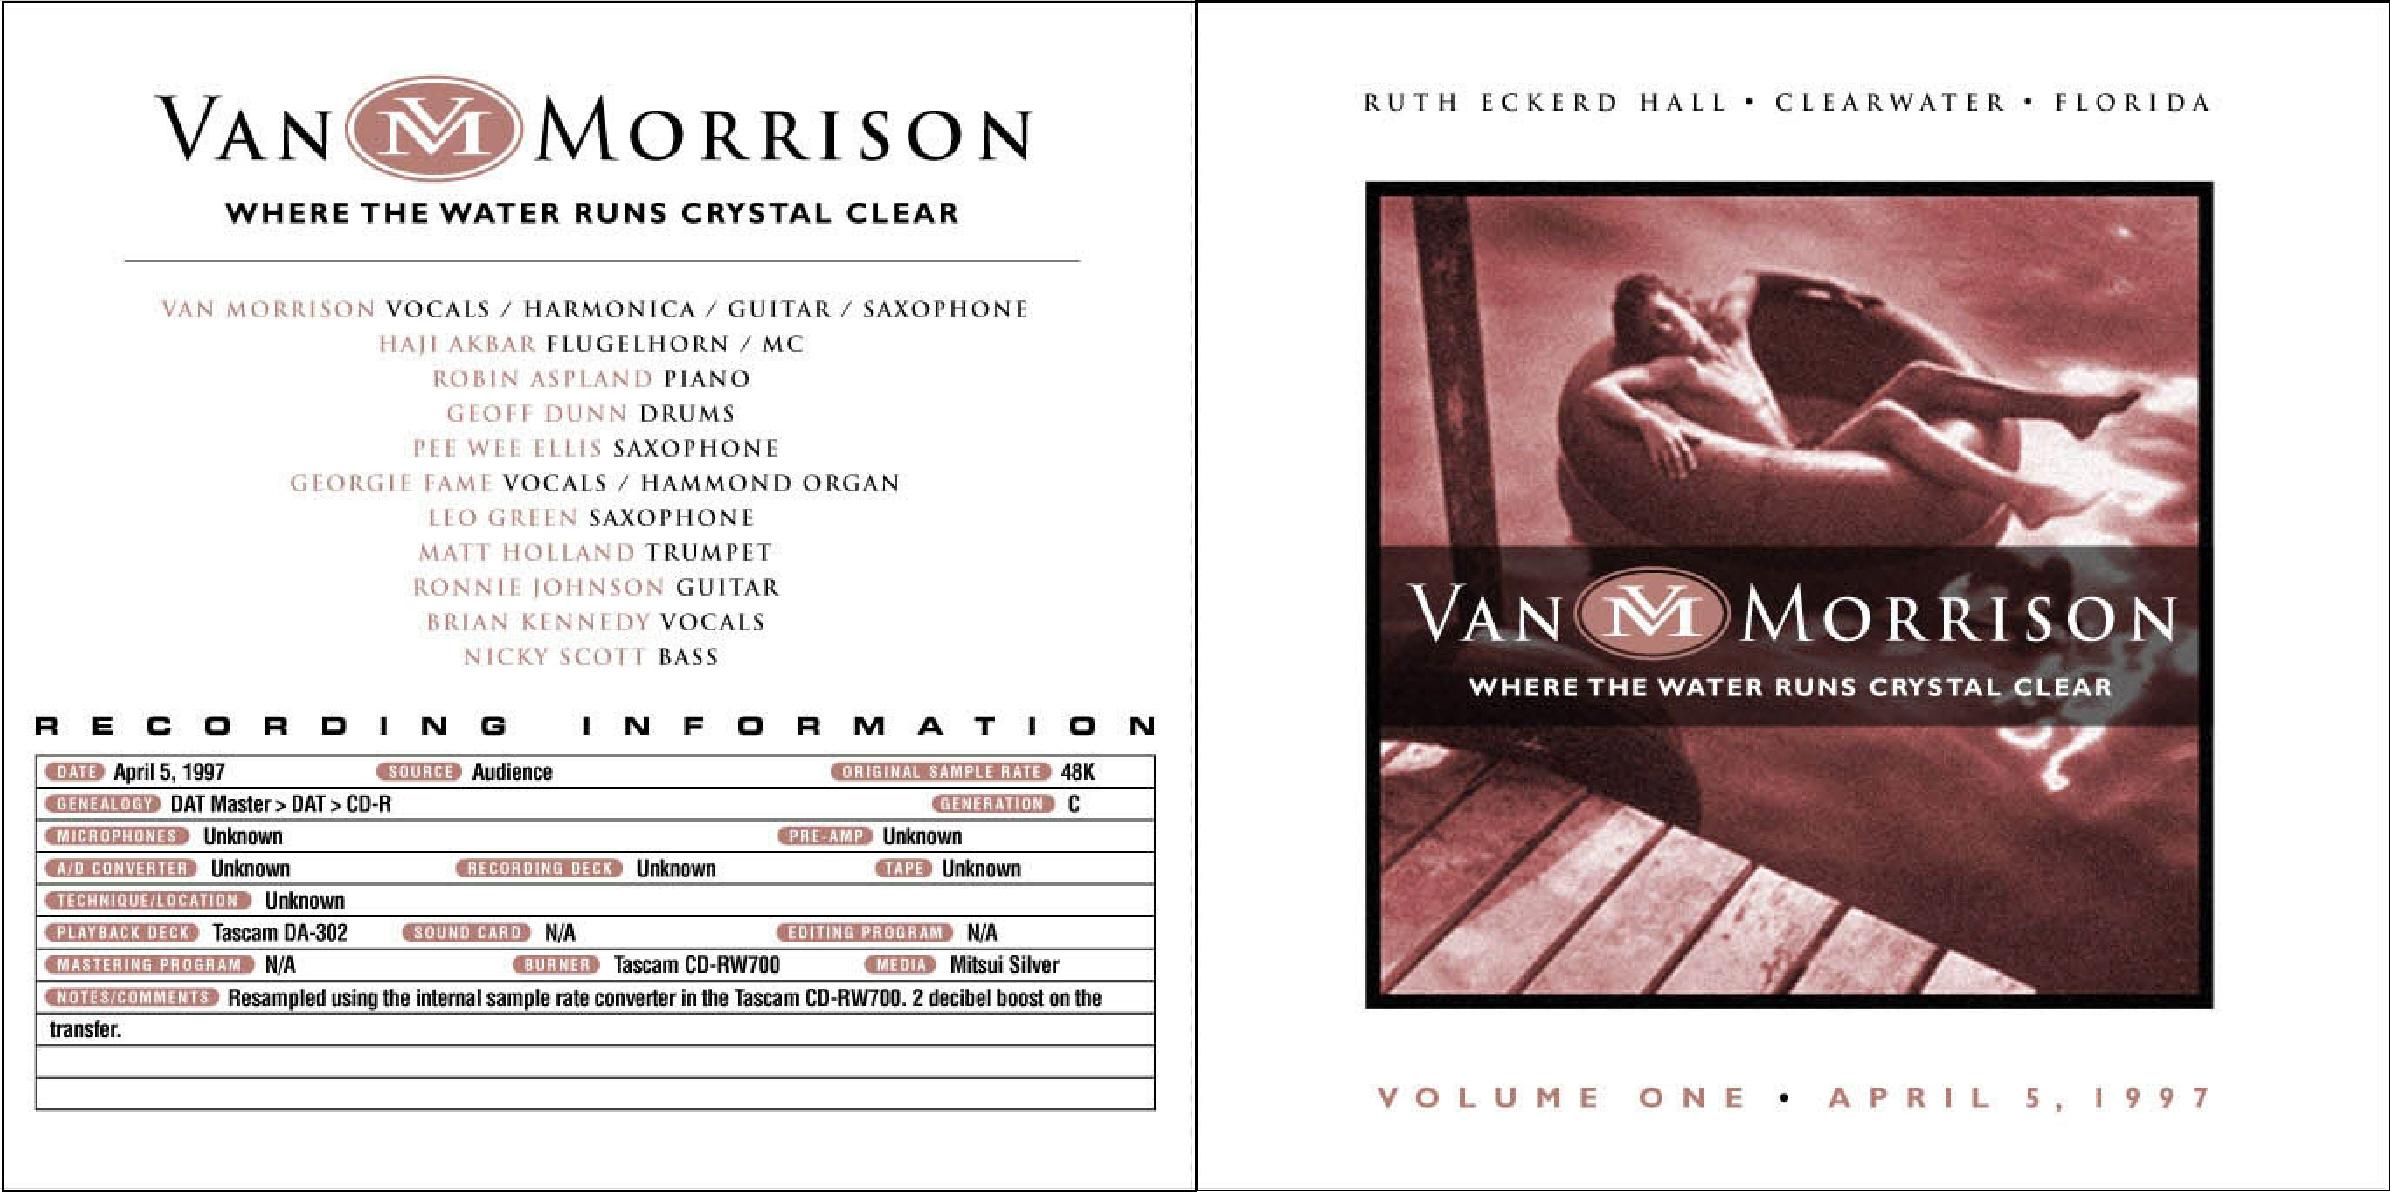 VanMorrison1997-04-05RuthEckerdHallClearwaterFL.jpg